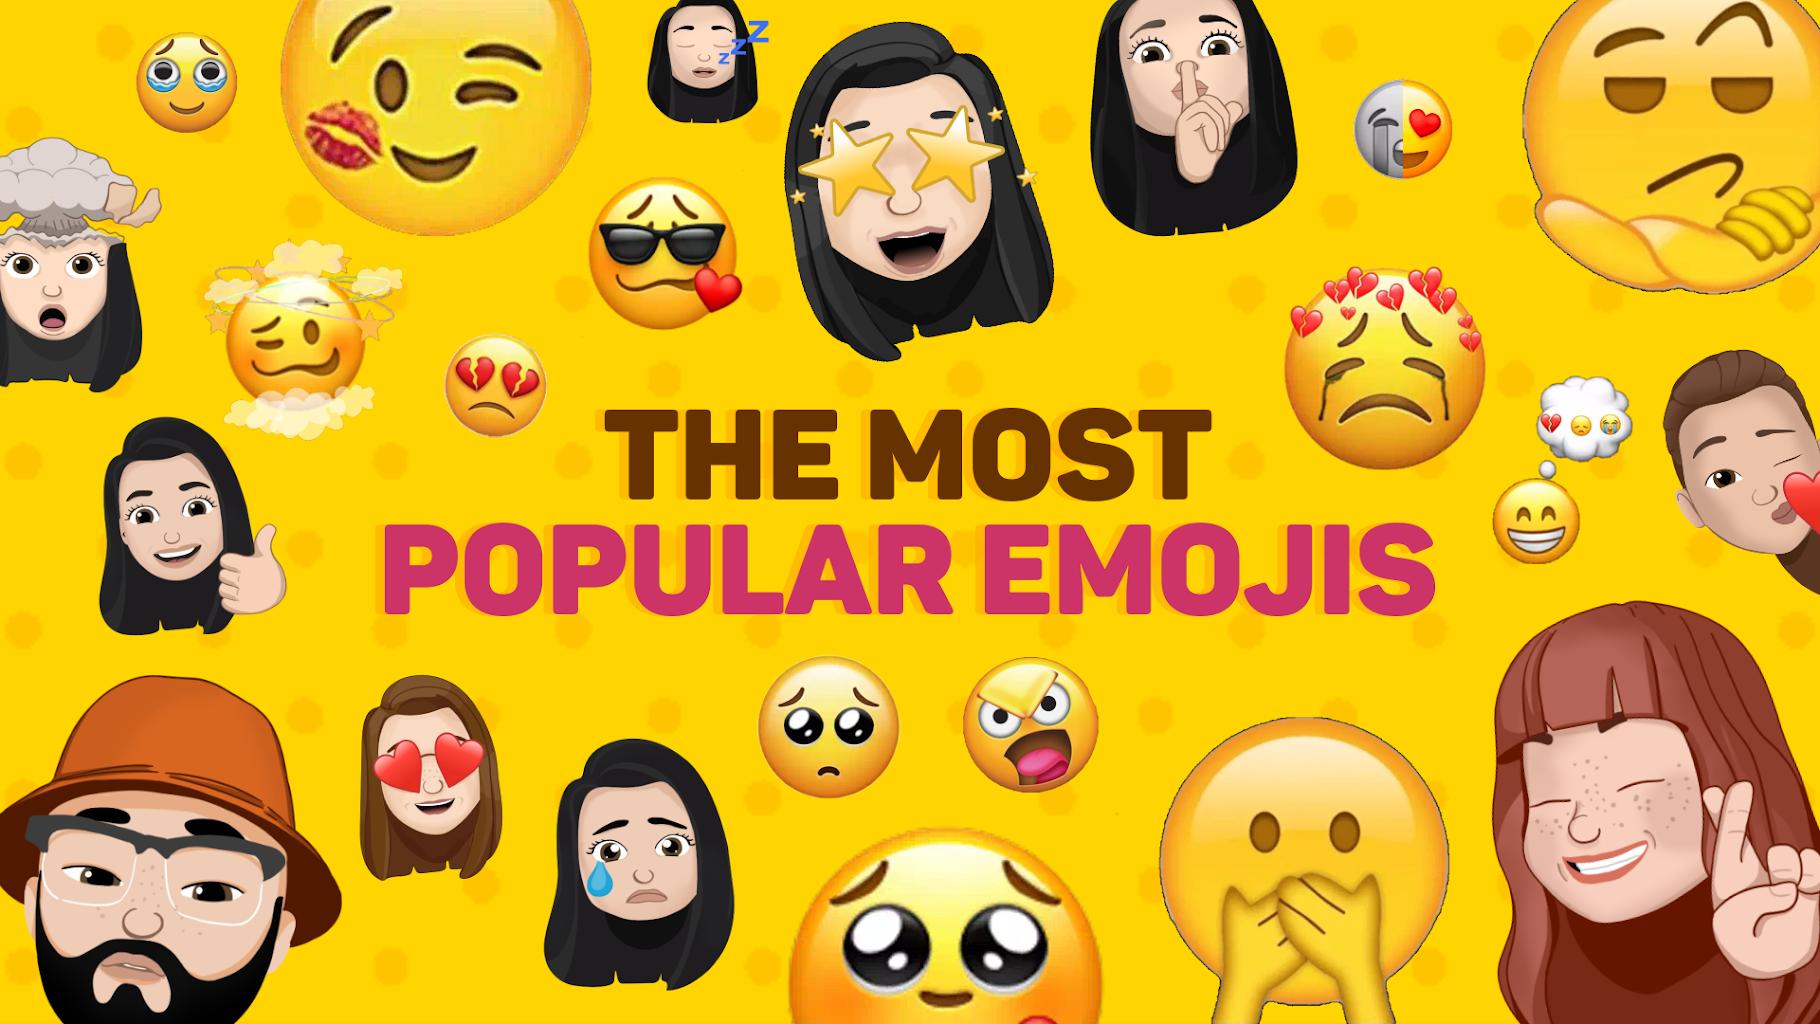 Yeni Komik Etiket Emoji Yi 3d Wastickerapps Android Icin Apk Indir